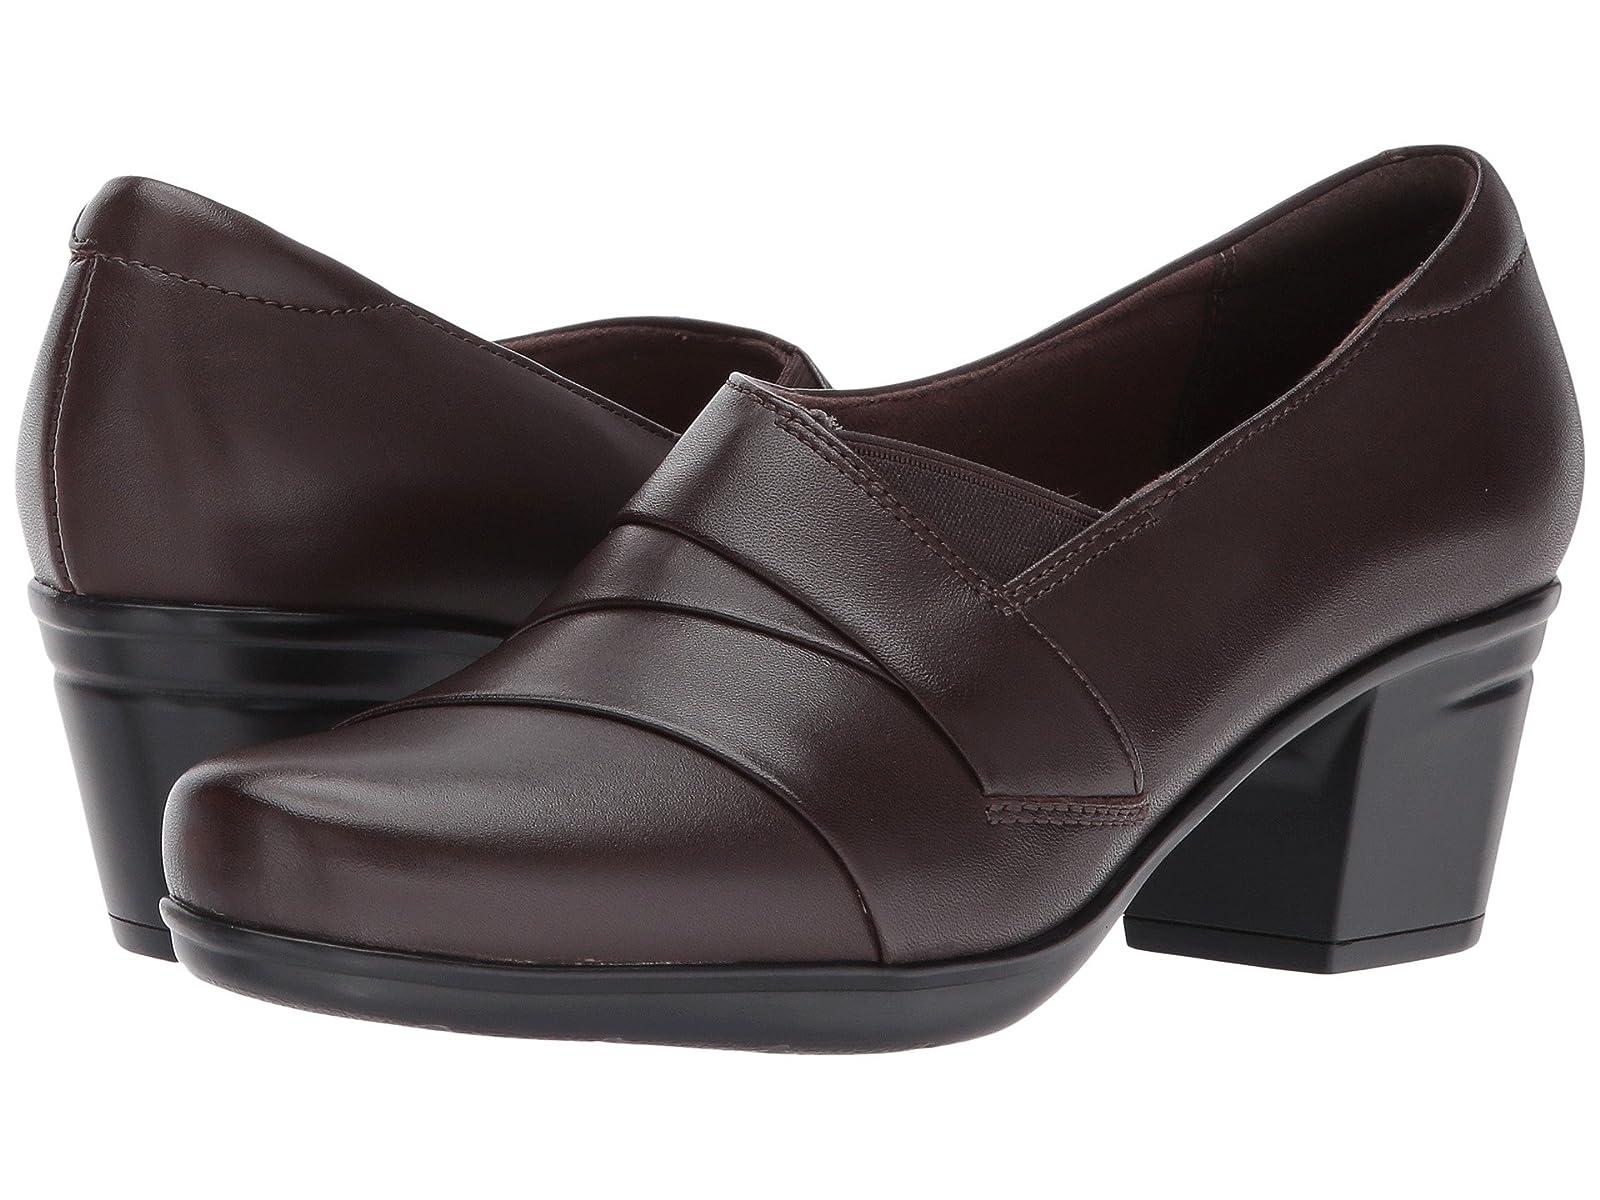 Clarks Emslie WarblerCheap and distinctive eye-catching shoes